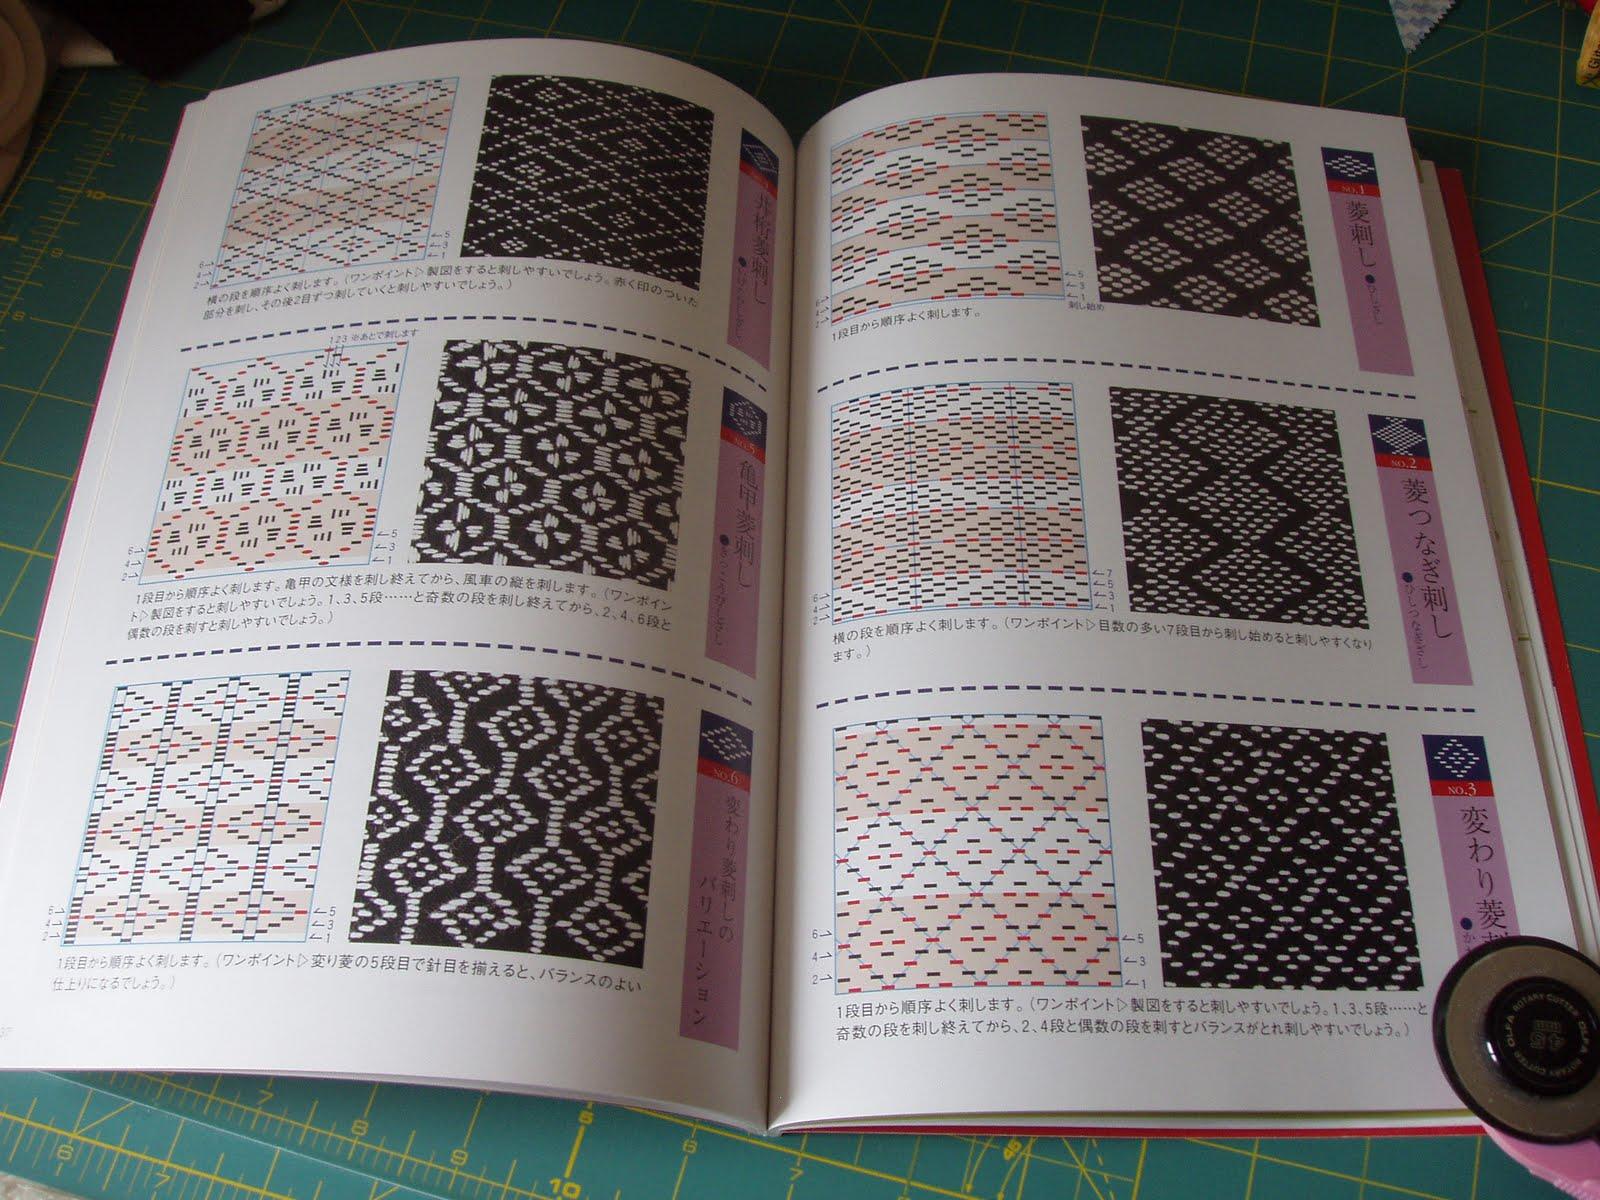 sashiko and other stitching: July 2010